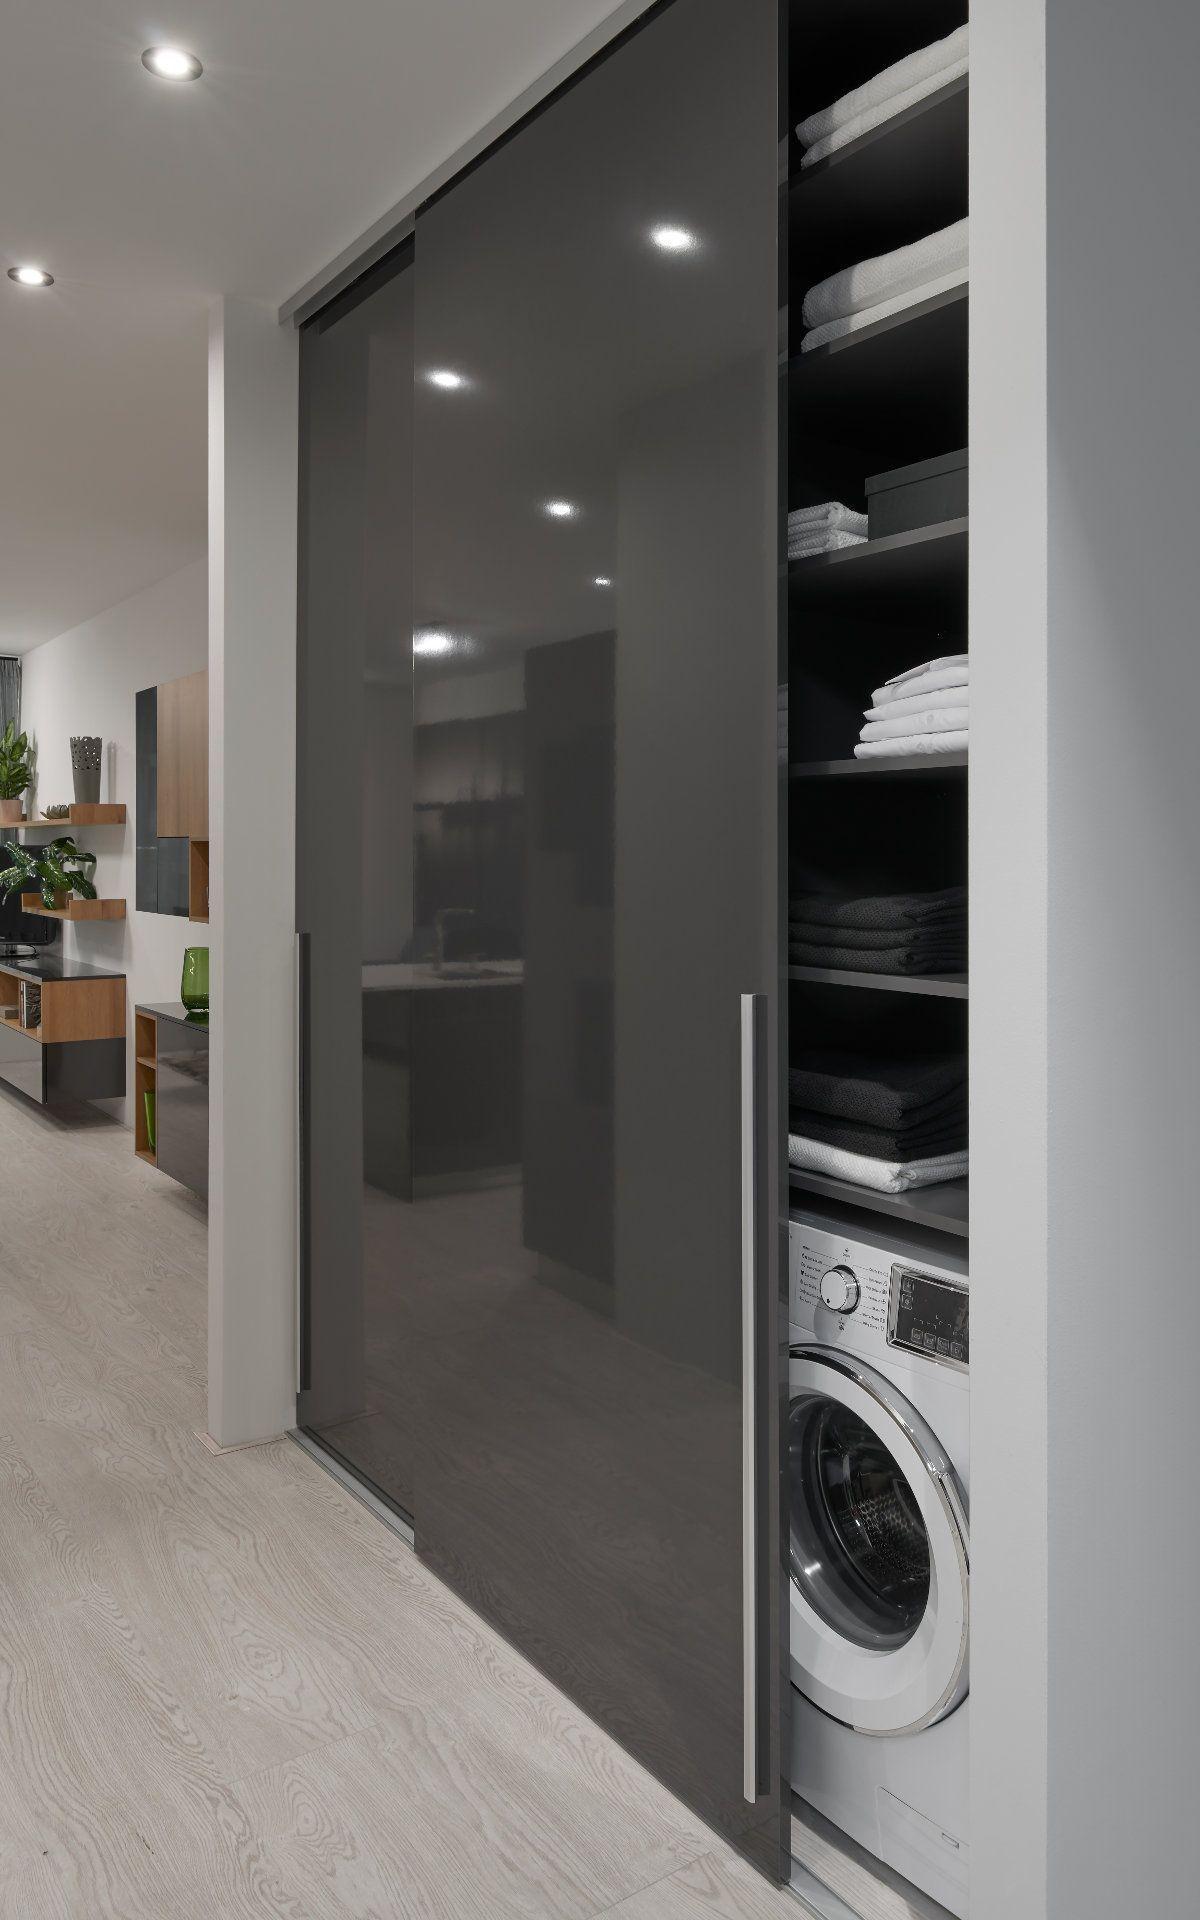 Photo of #satniskrin #skrin #wardrobe #slidinigdoor #open kitchen – My Blog